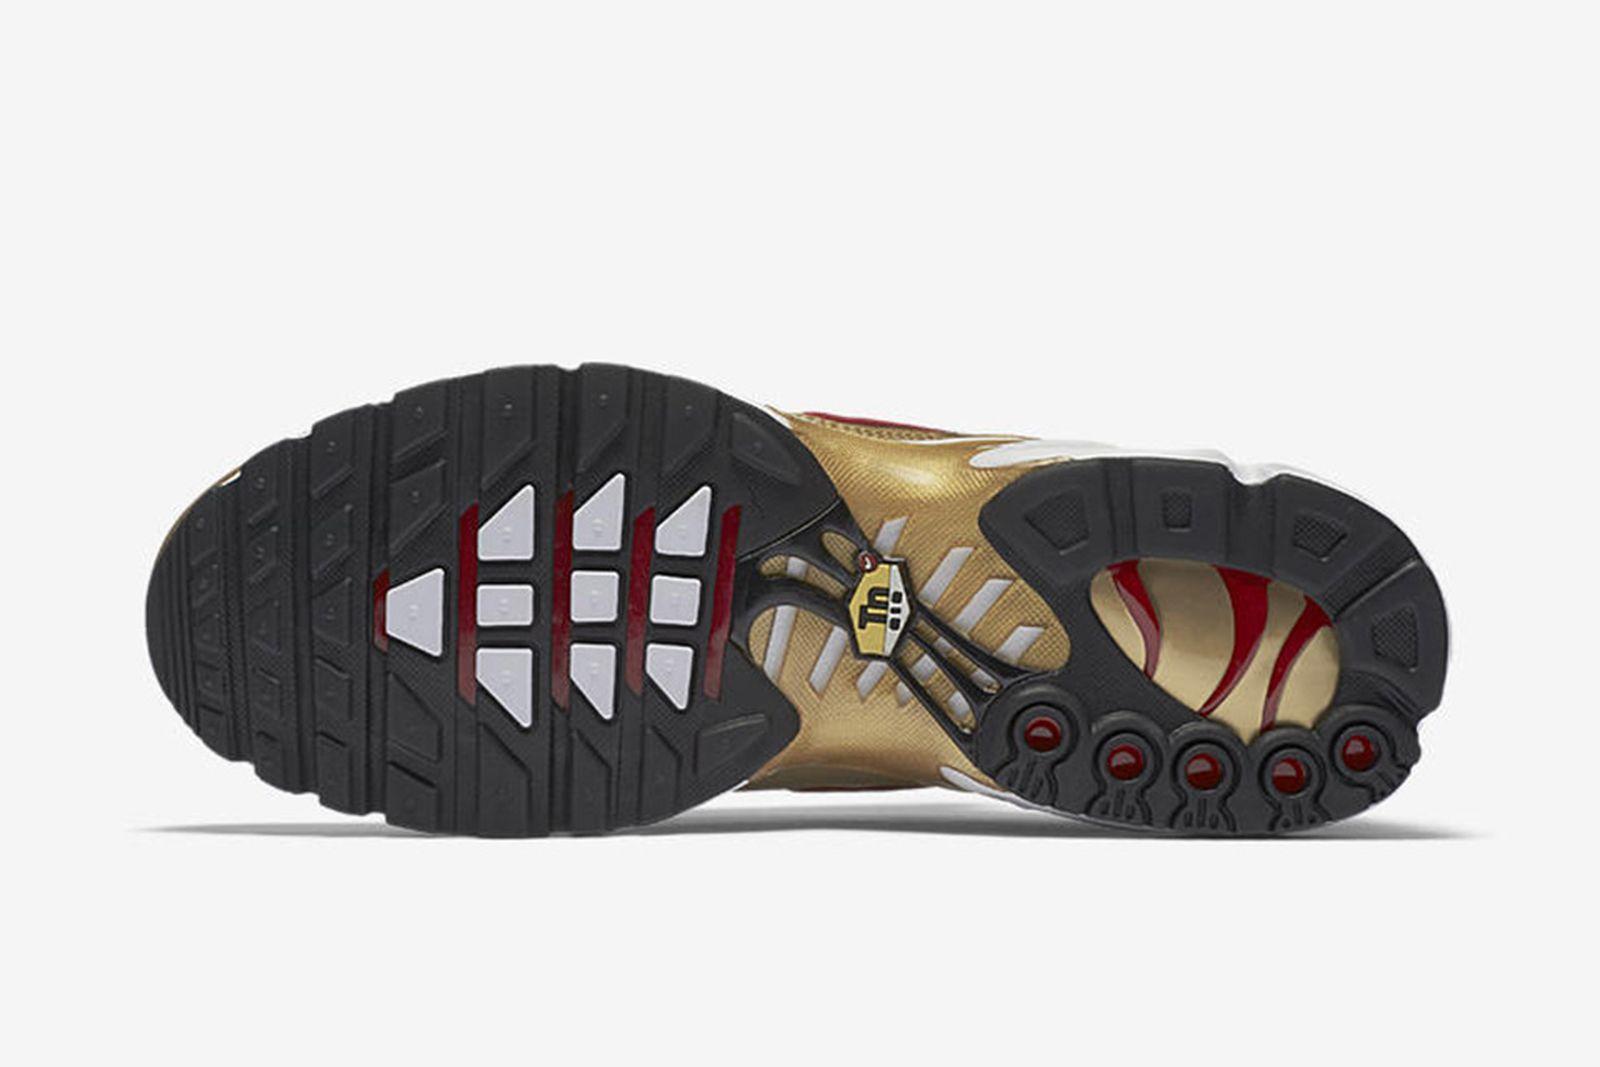 nike-air-vapormax-97-metallic-gold-release-price-09